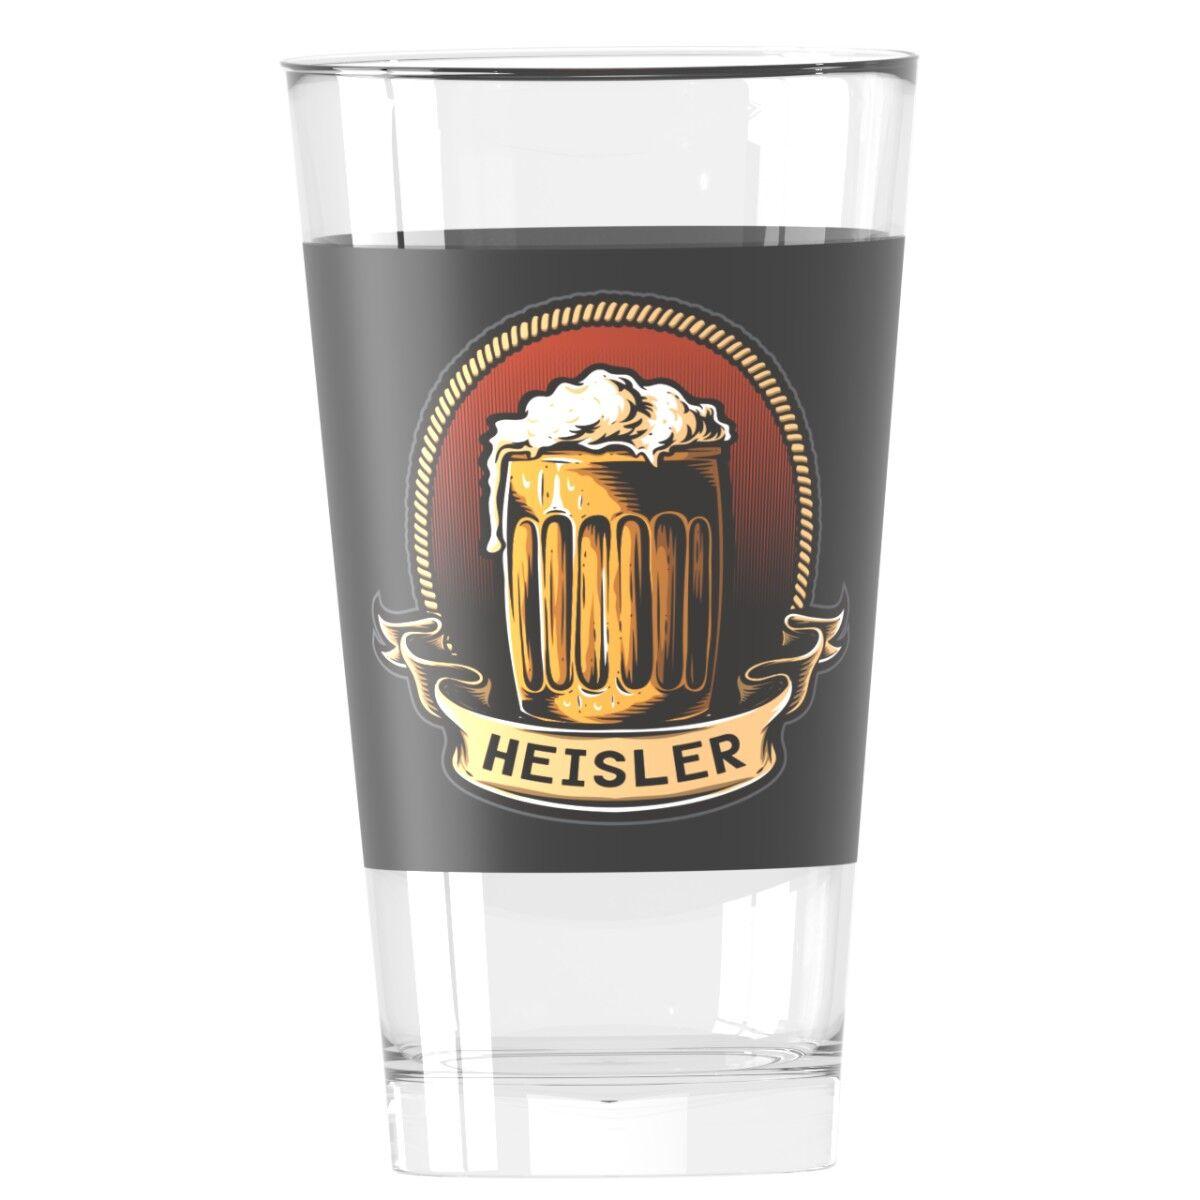 580ml beer glass